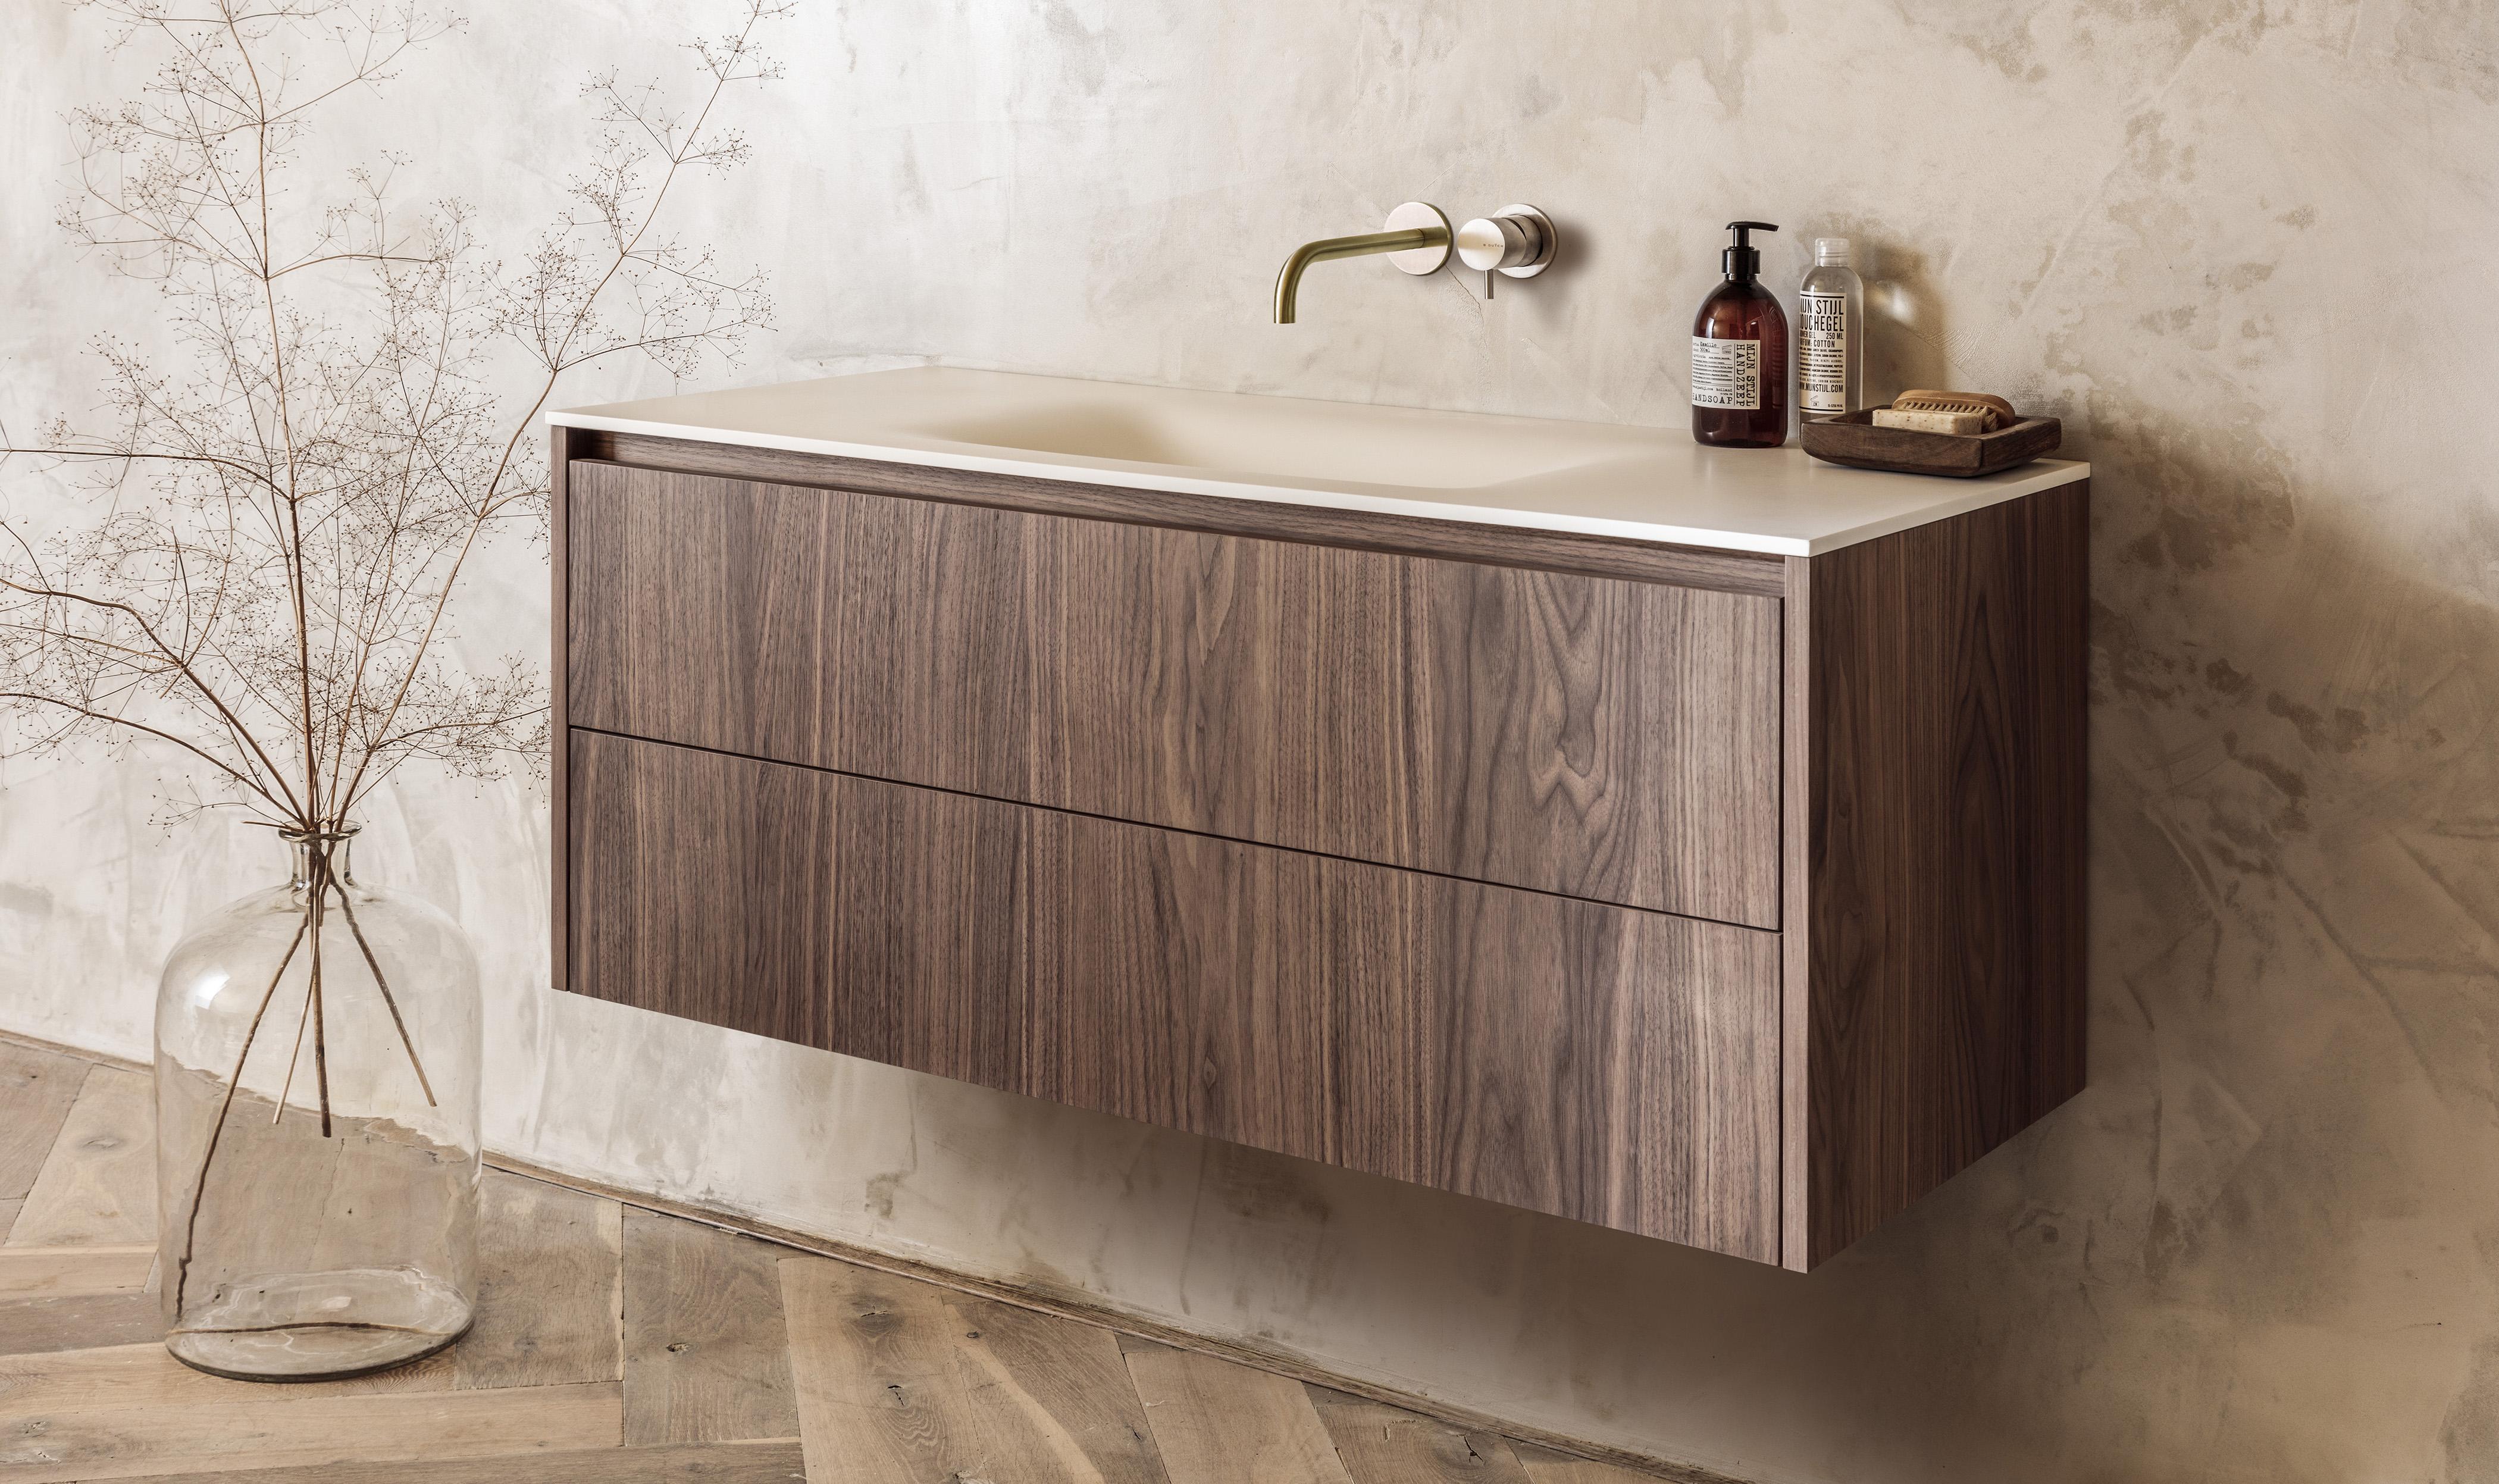 Design maatwerk badkamermeubels B Dutch Cuijk Solid Surface